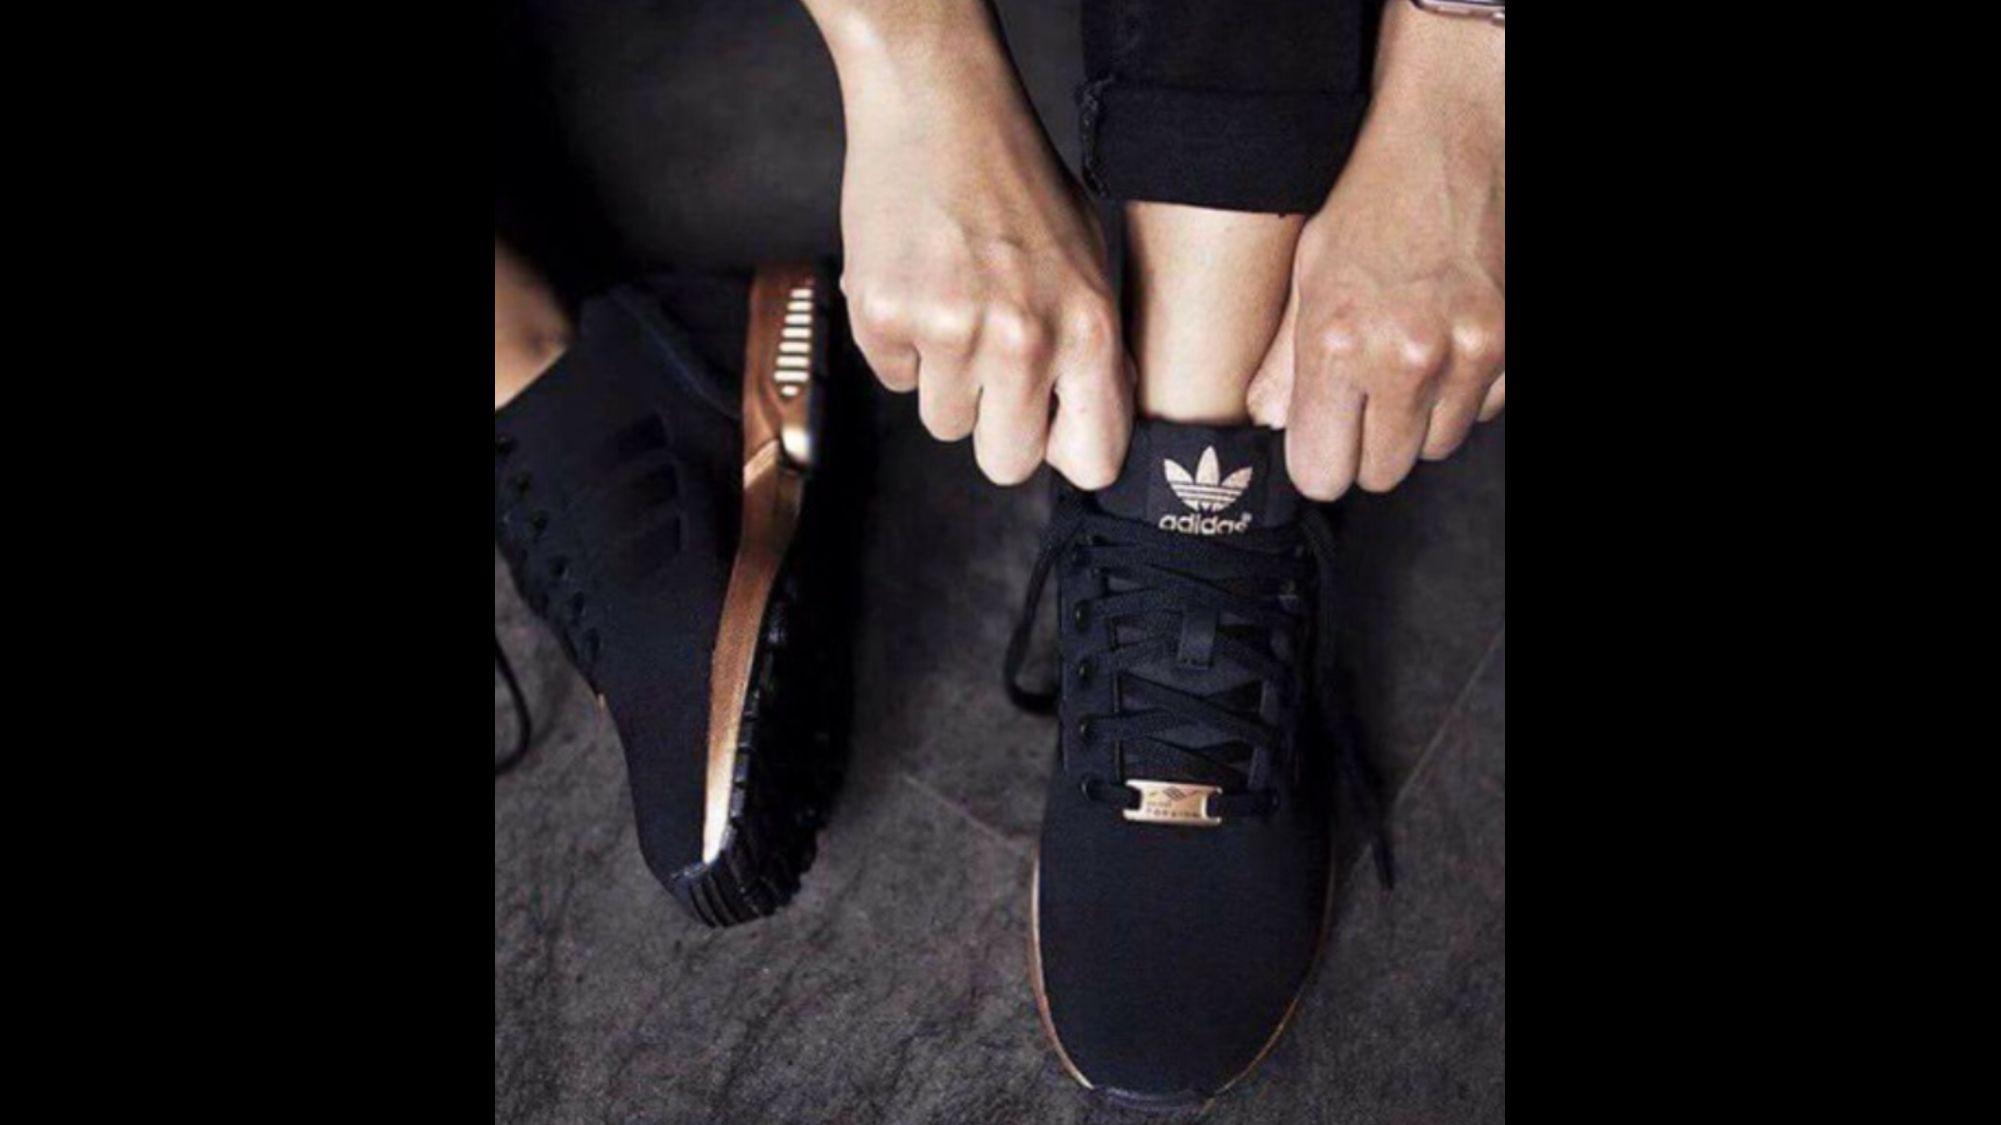 Adidas 2016 | Black adidas shoes, Black running shoes, Adidas women